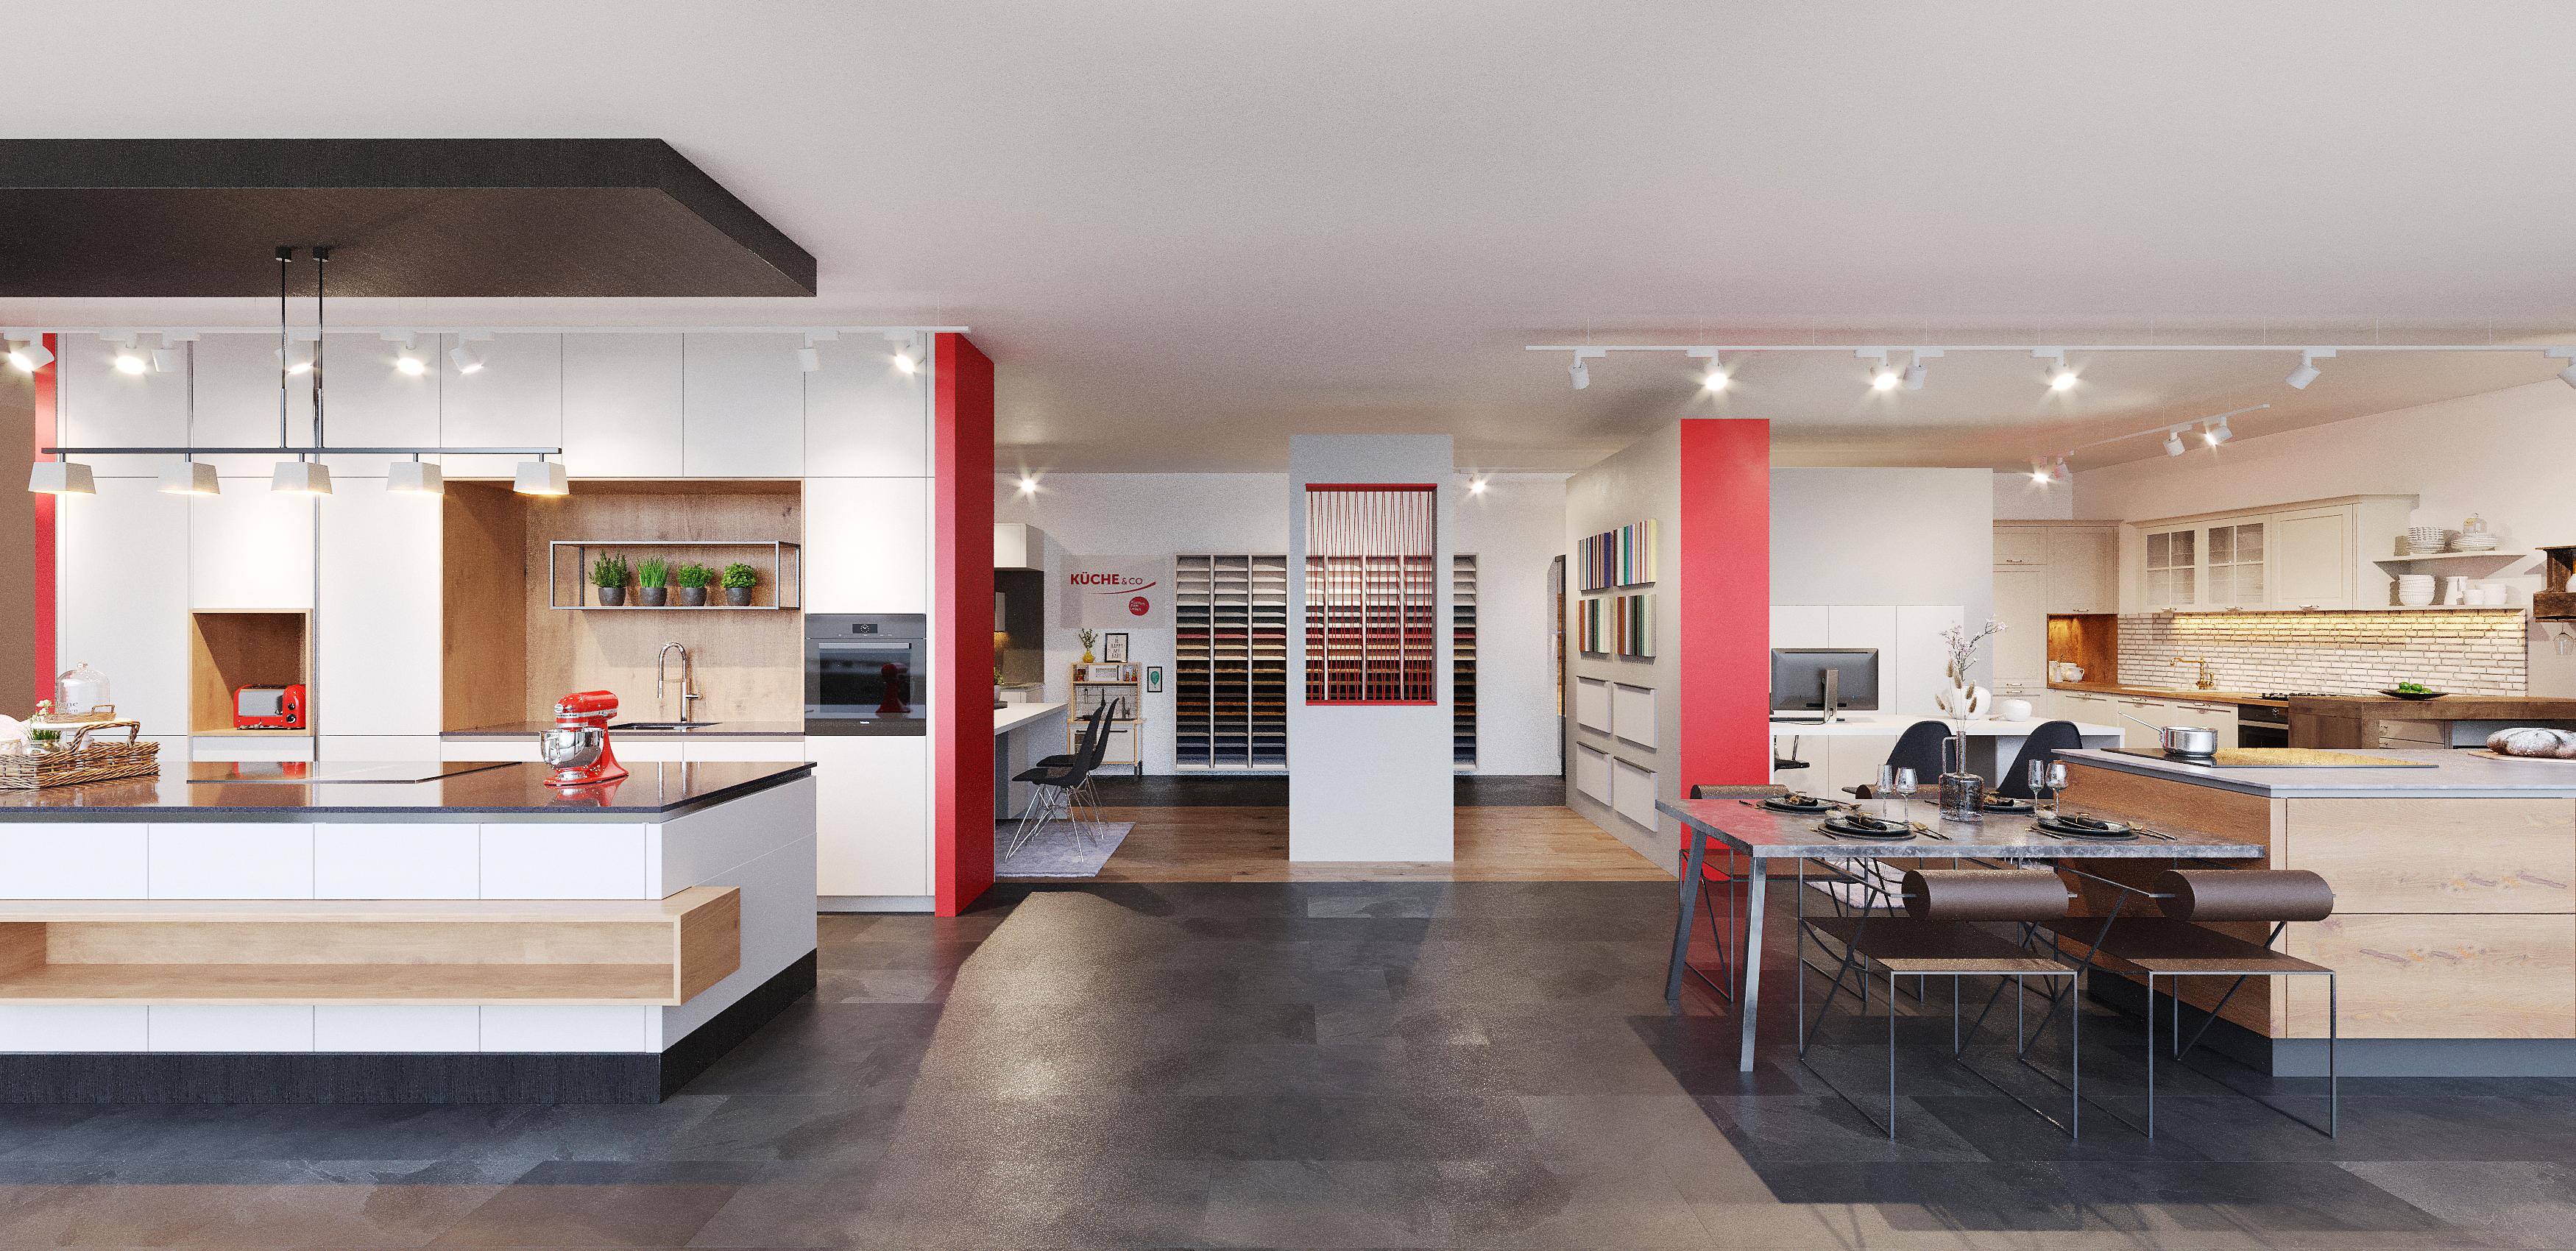 Küche&Co Gmbh -Virtuelles Studio-